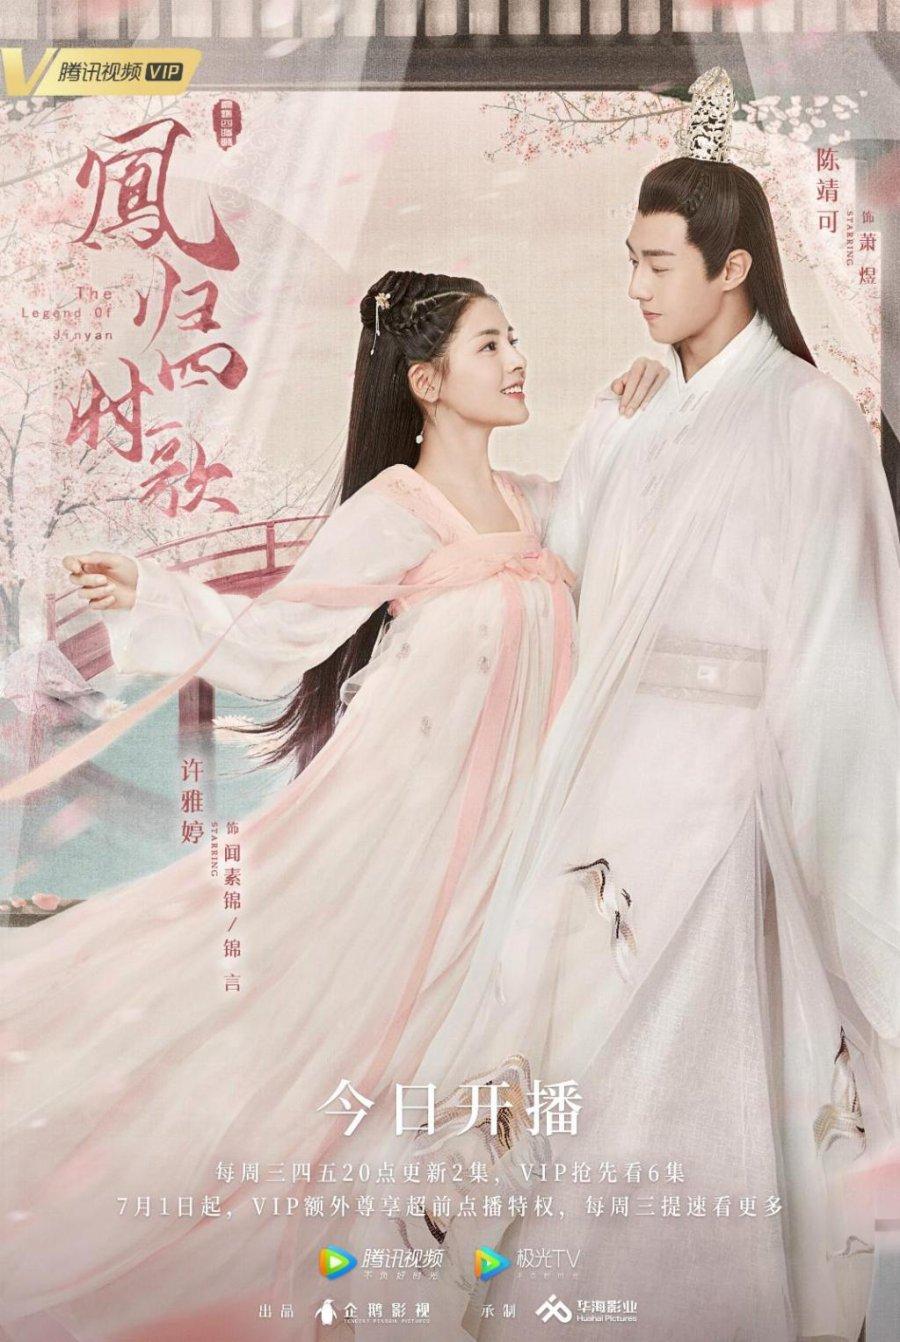 the-legend-of-jin-yan-ตำนานเพลงรักสี่ฤดู-ซับไทย